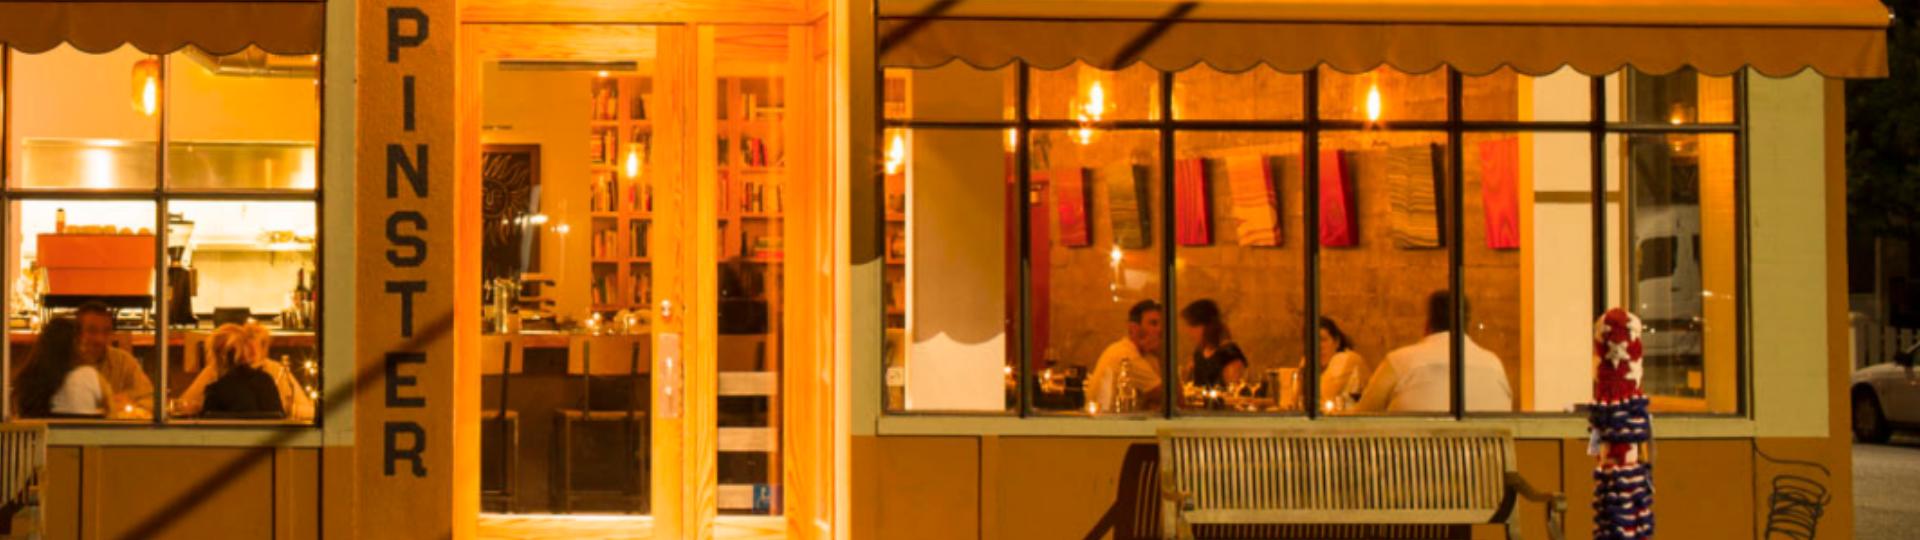 restaurant exterior, the spinster